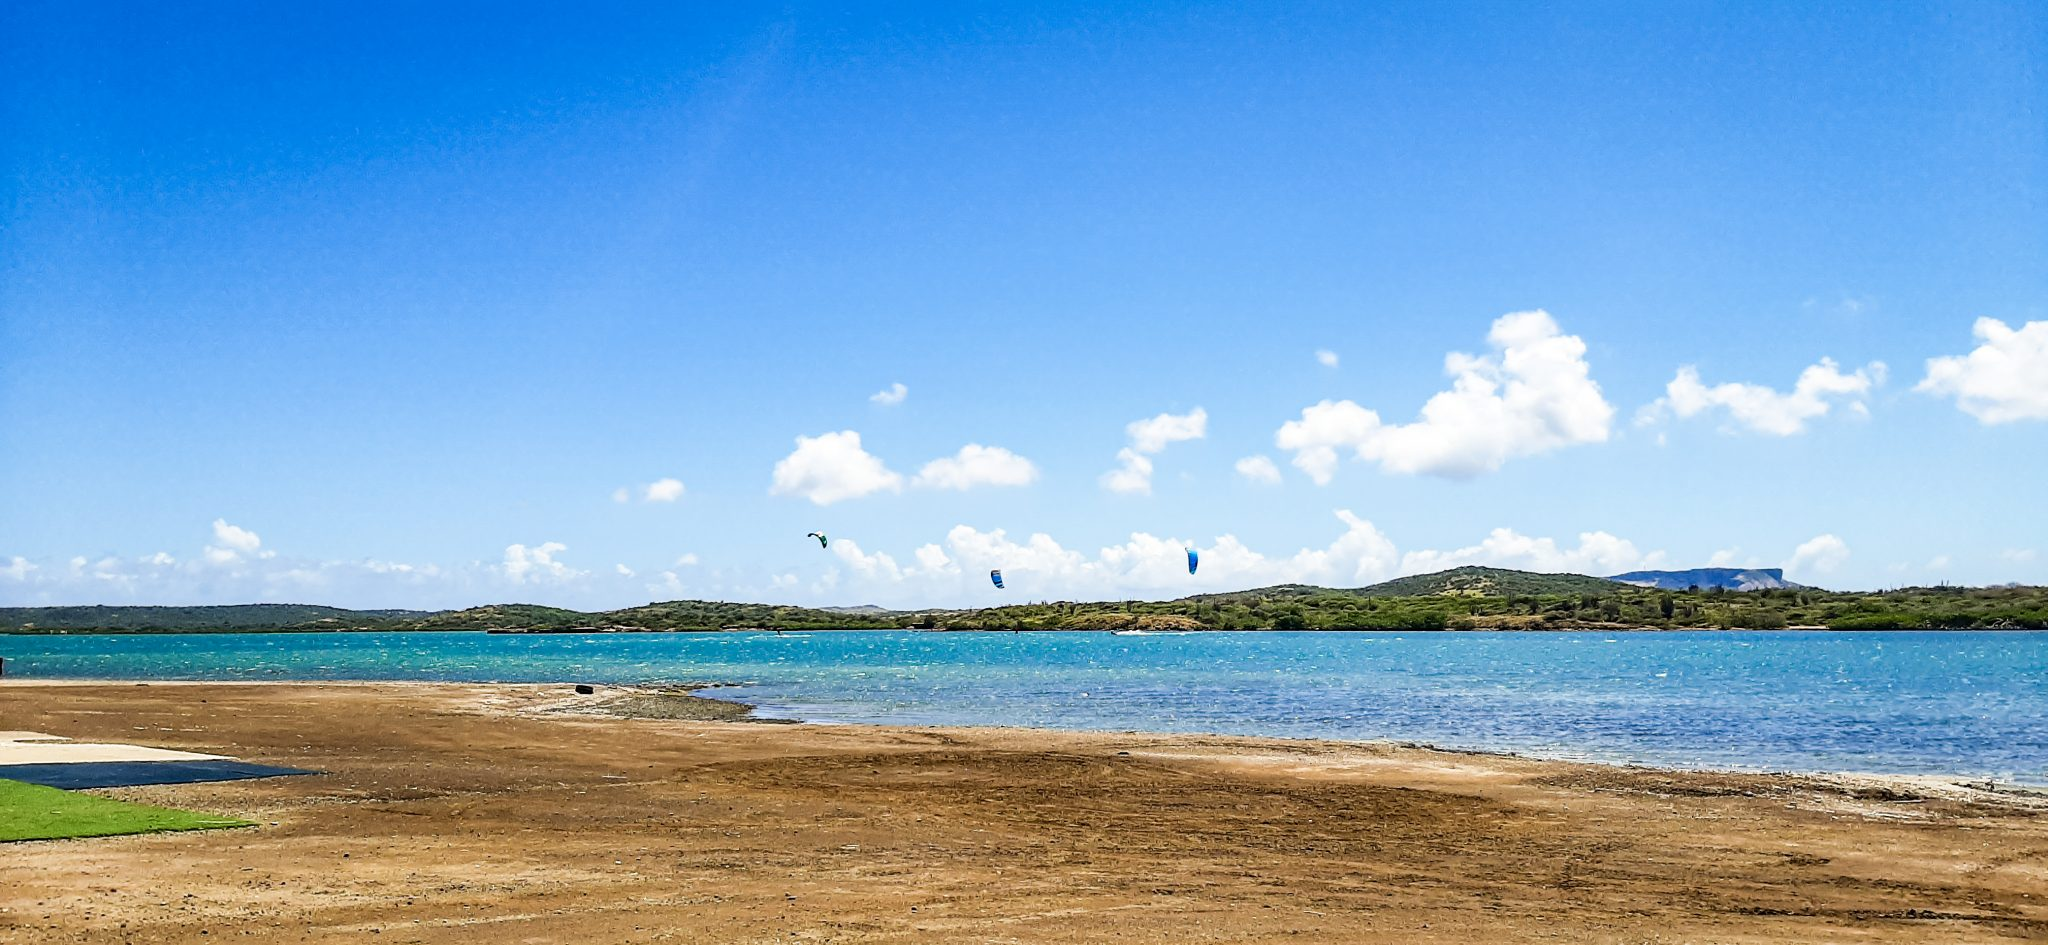 awa salu kiteboarding   Kitesurfen curacao